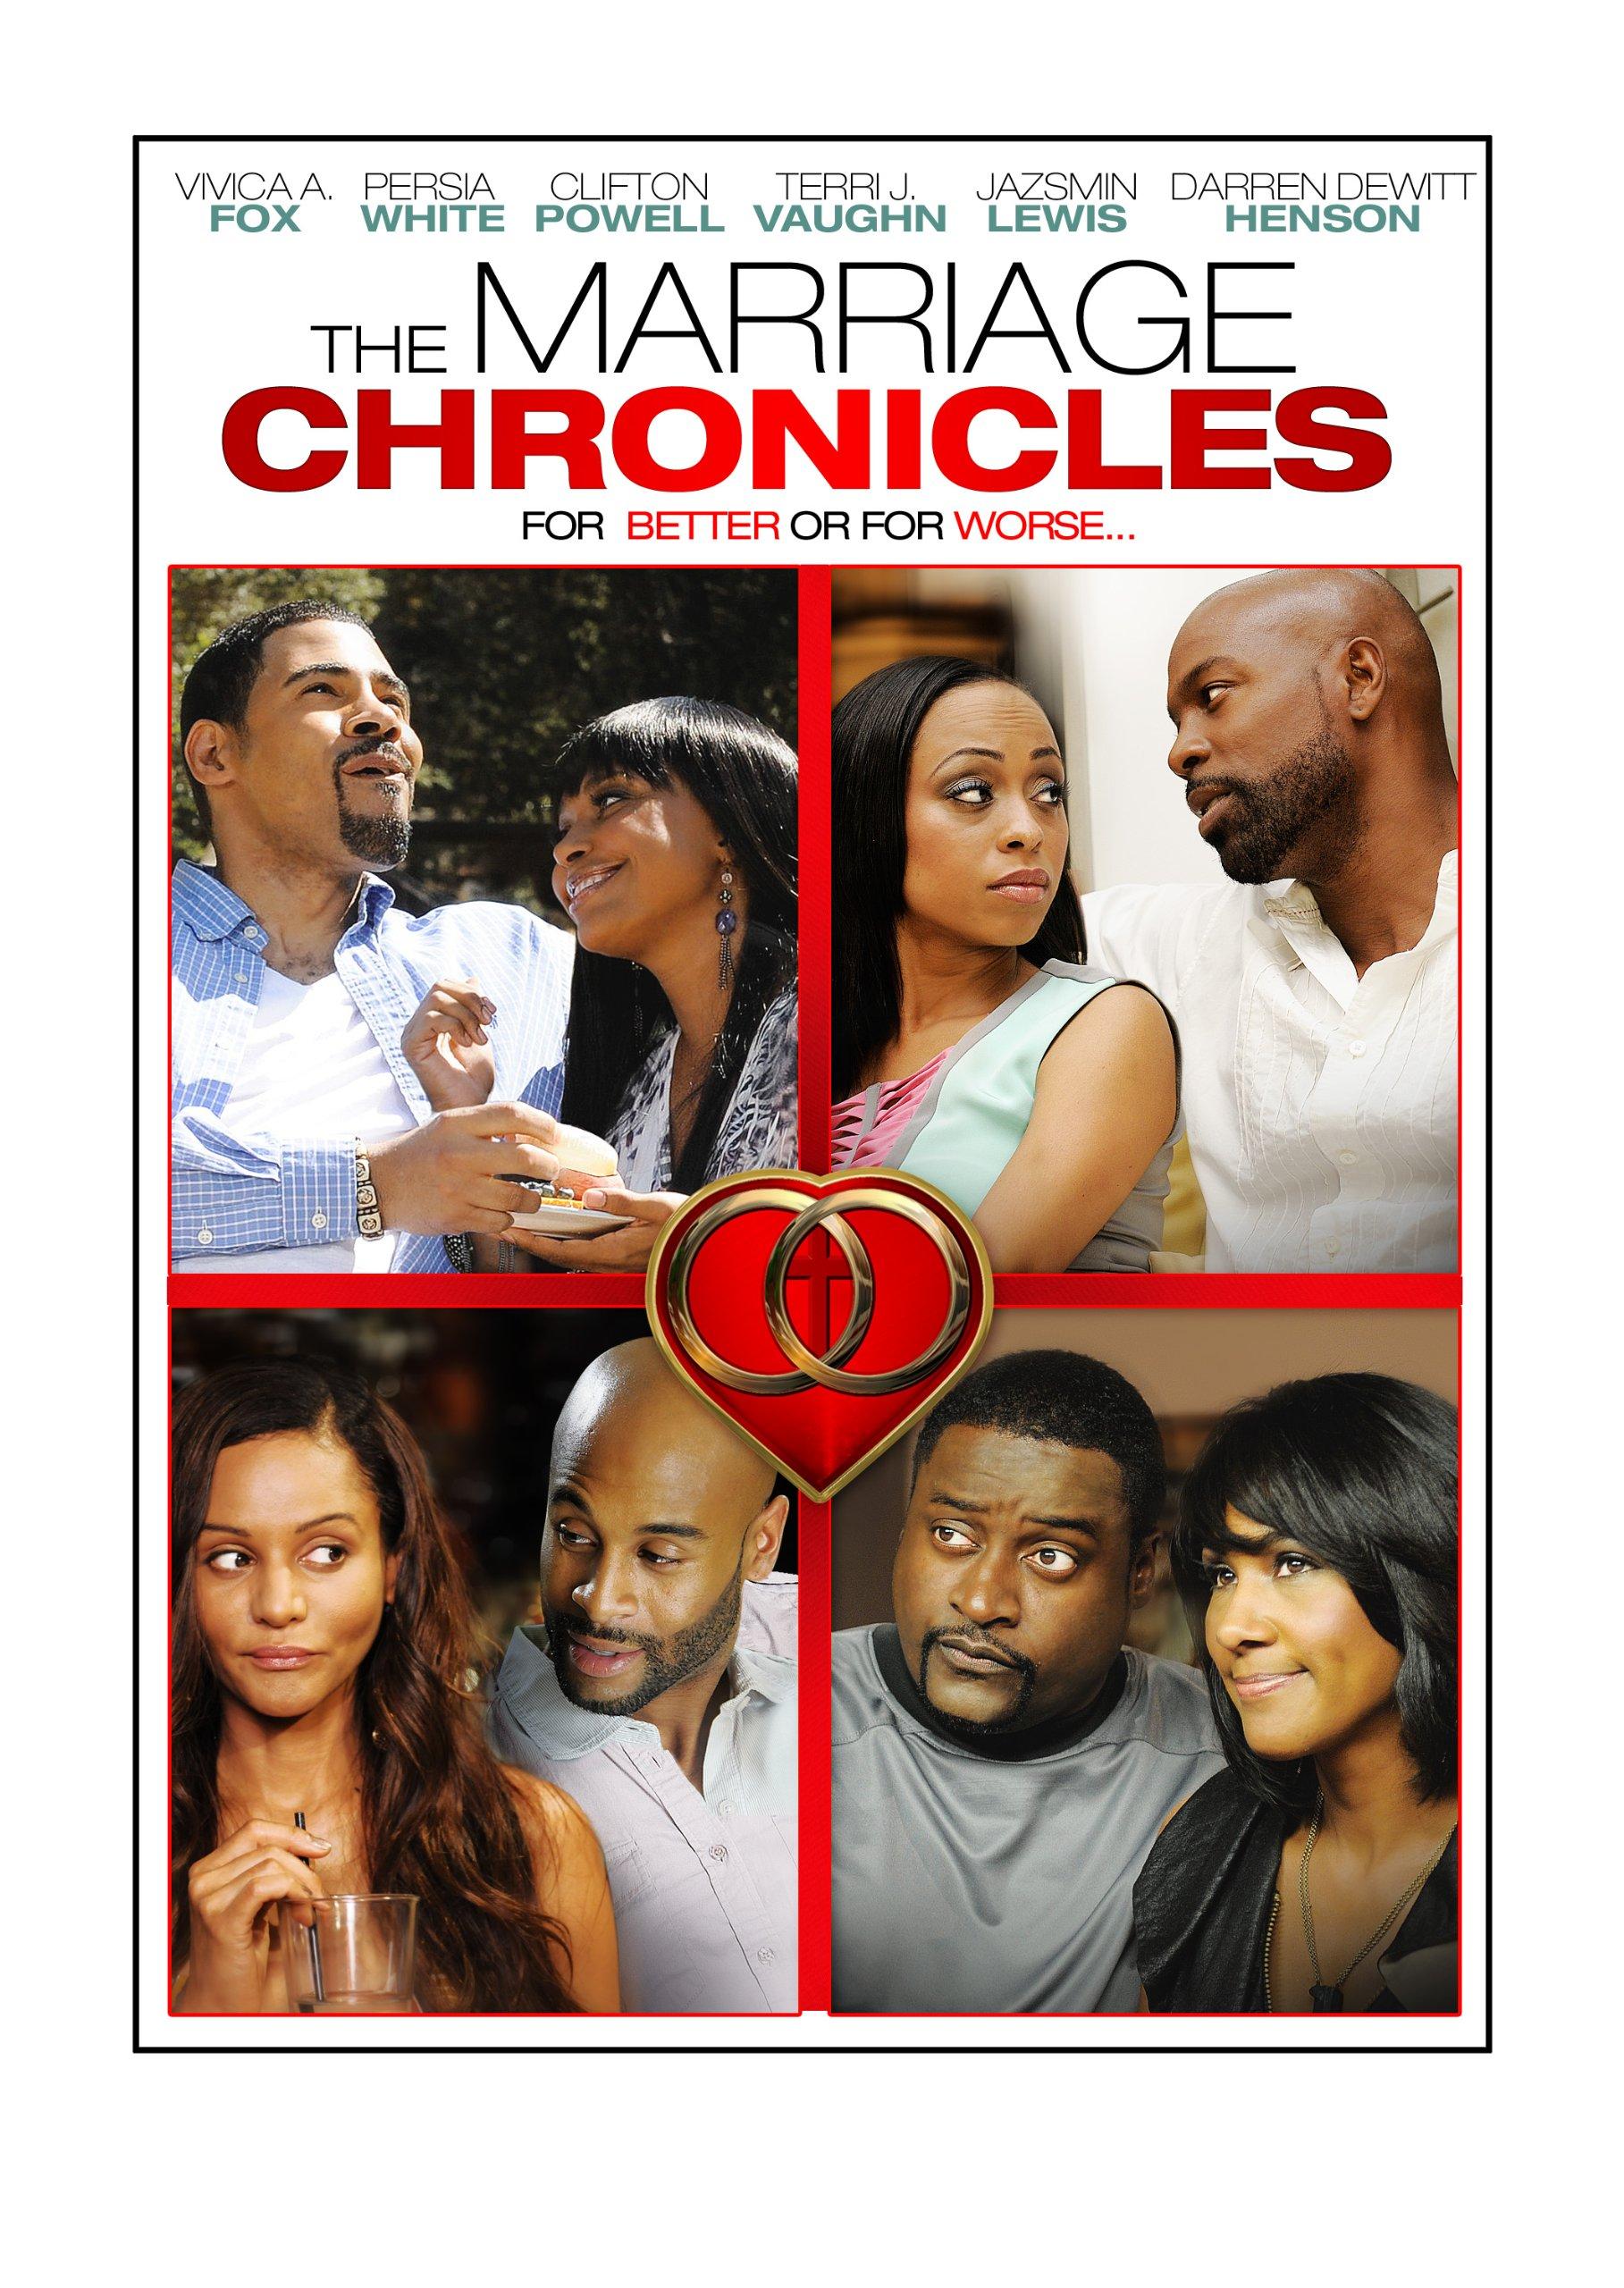 DVD : Terri J. Vaughn - The Marriage Chronicles (Dolby, AC-3)